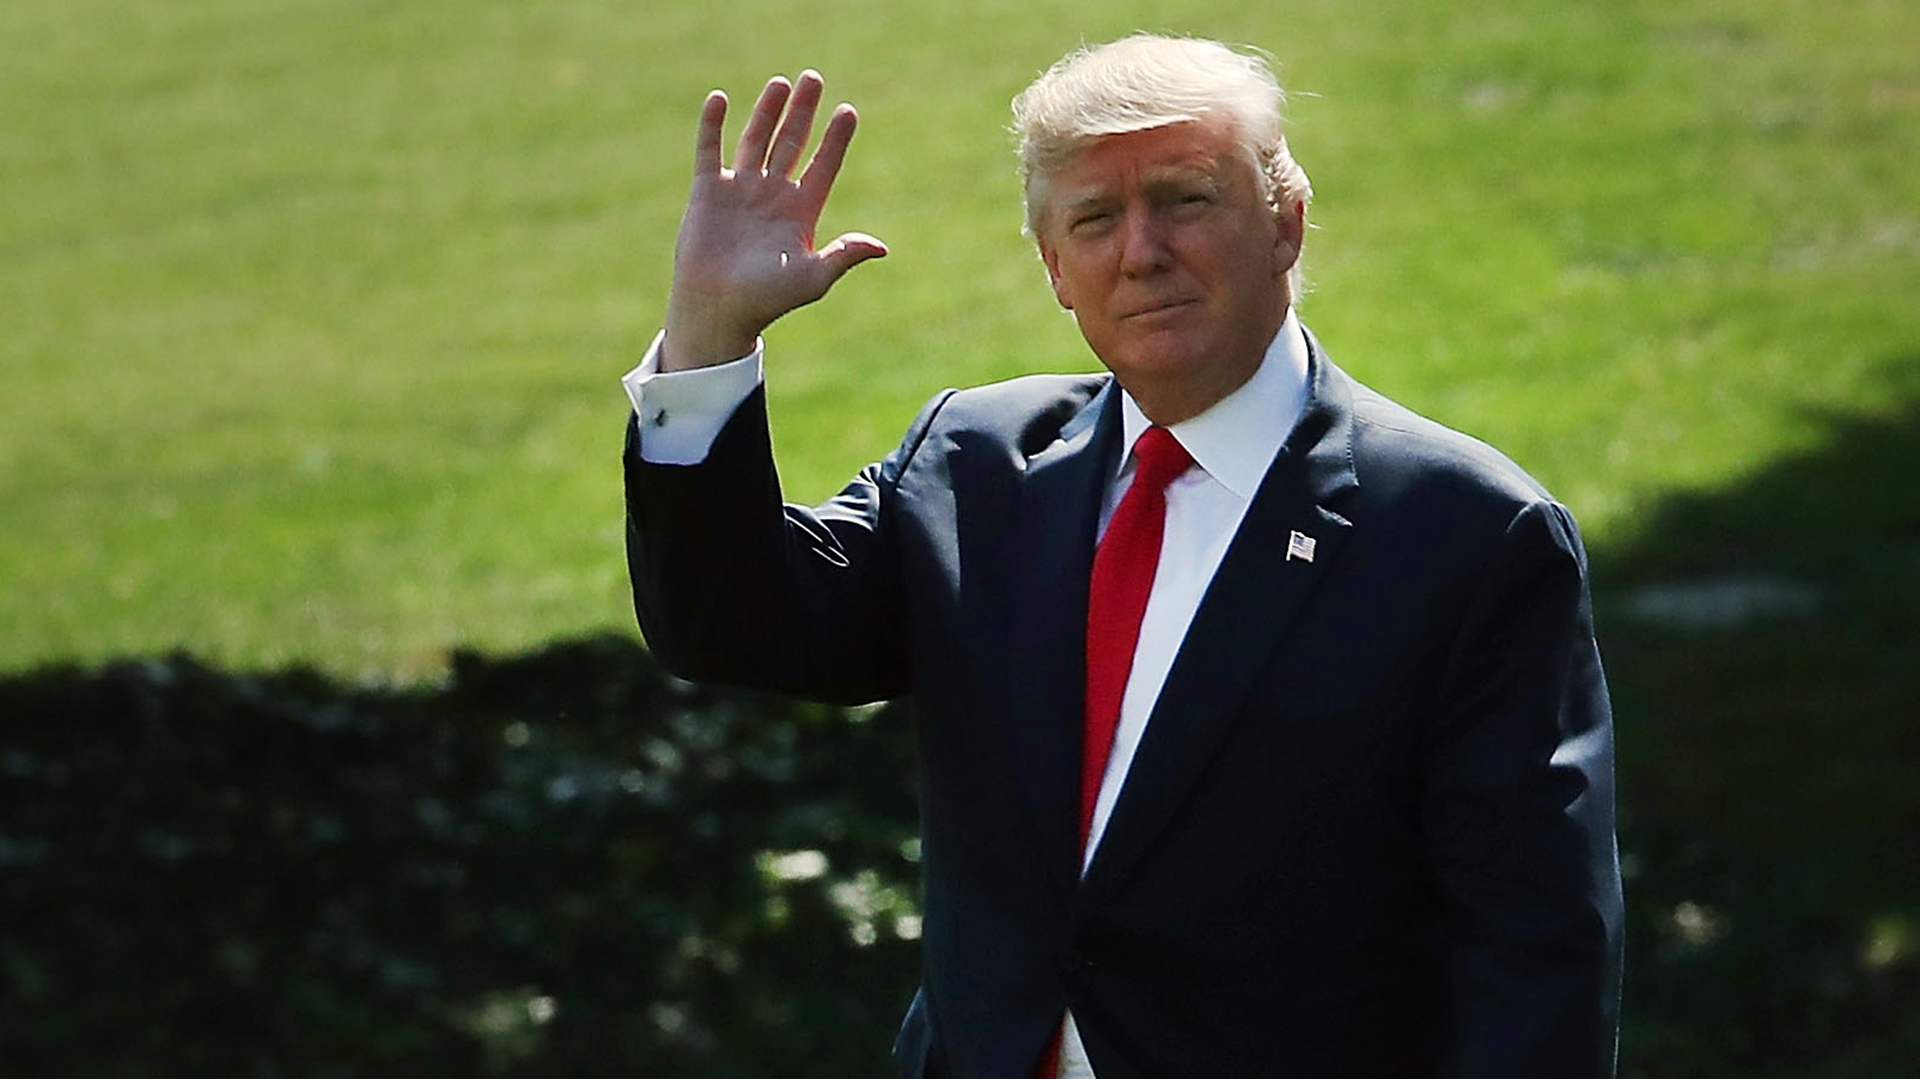 Donald Trump waves leaving White House-159532.jpg47685211